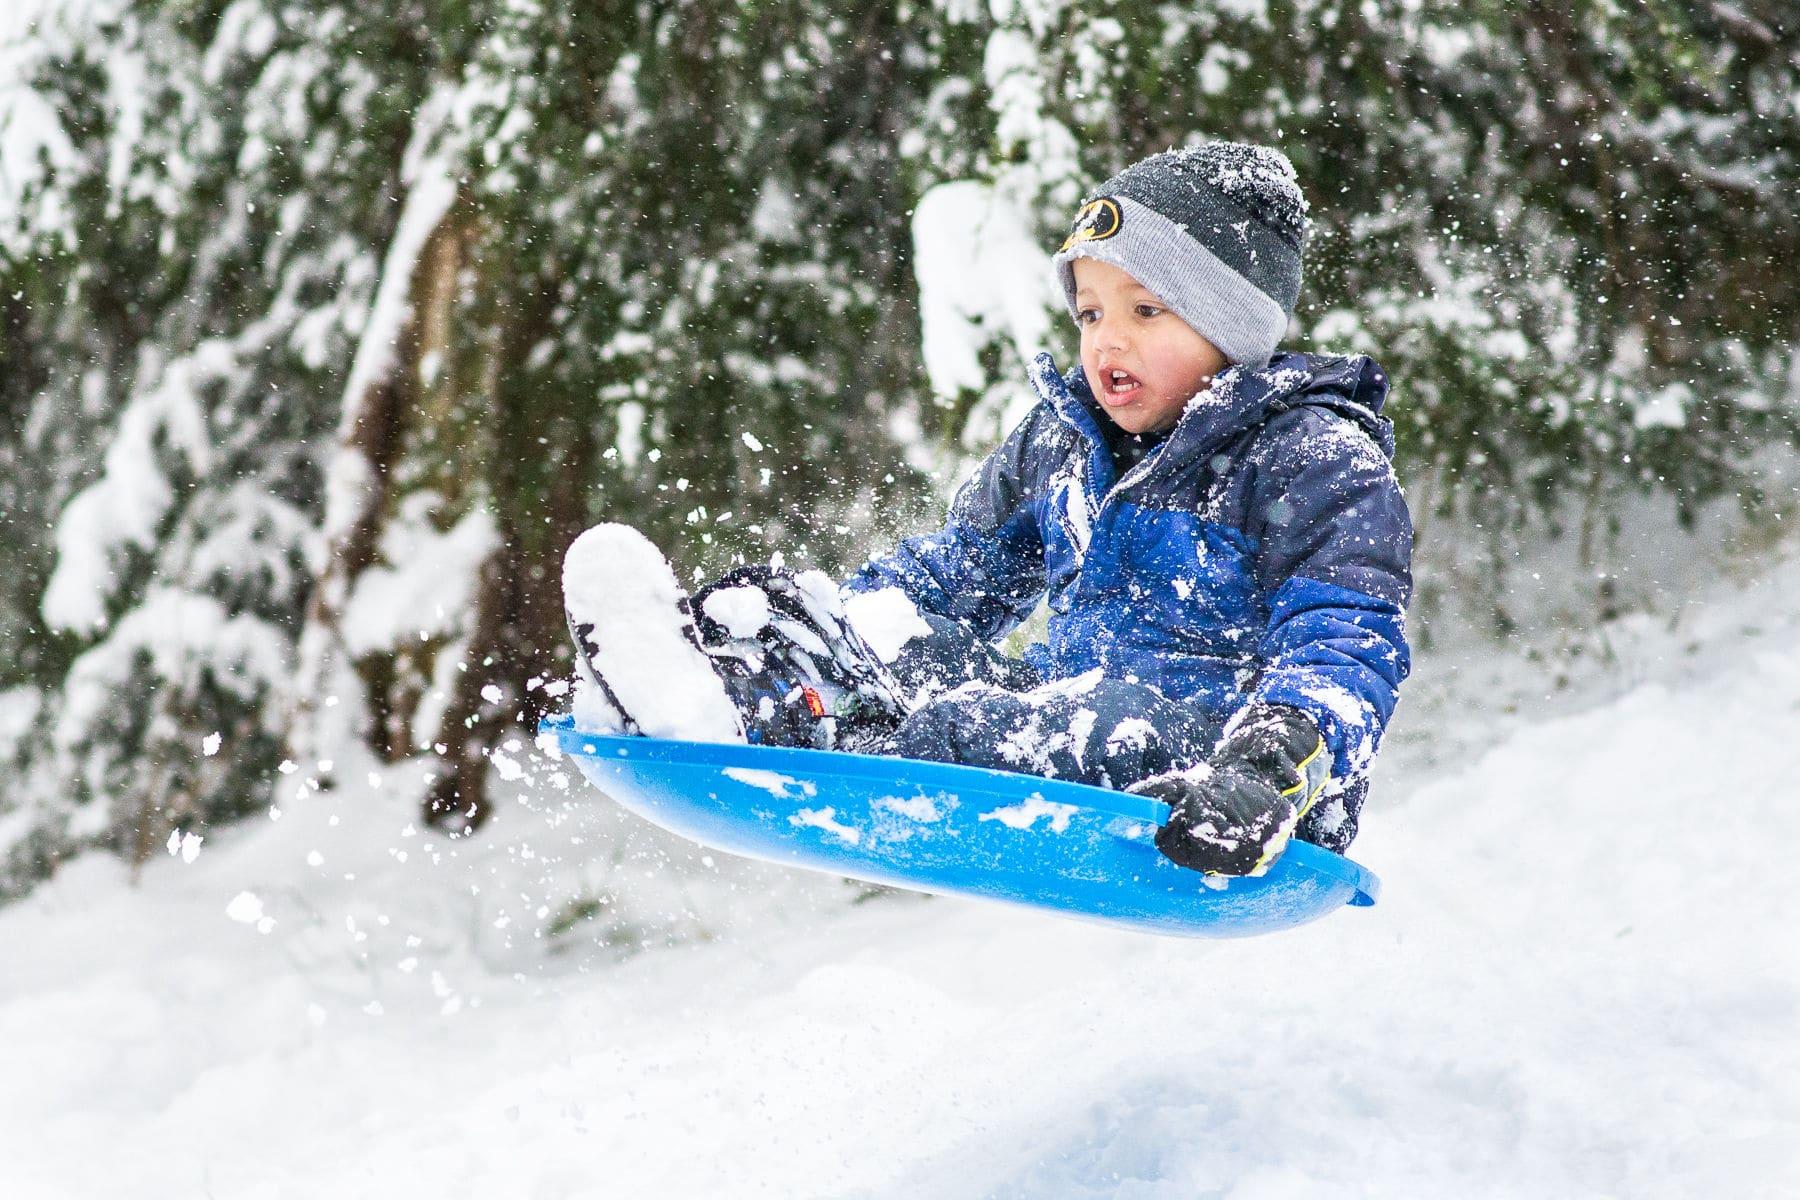 Quinn Brogan of Ashburn, Virginia, catches some airtime while enjoying the snow Sunday. (Courtesy Doug Heath)